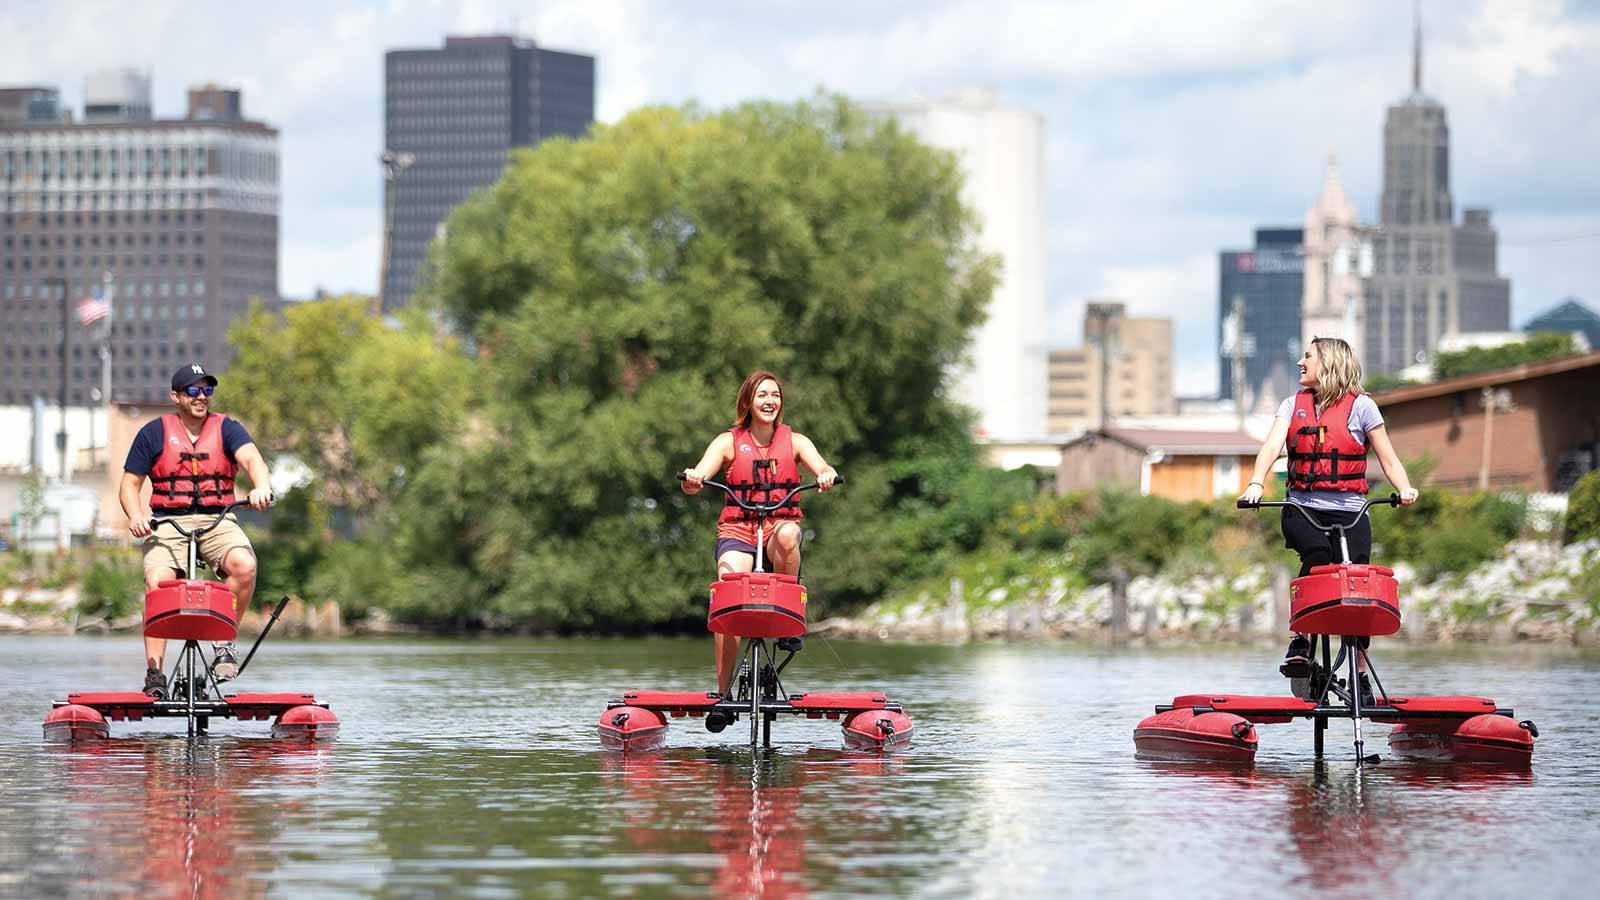 riverworks-waterbikes-1600x900